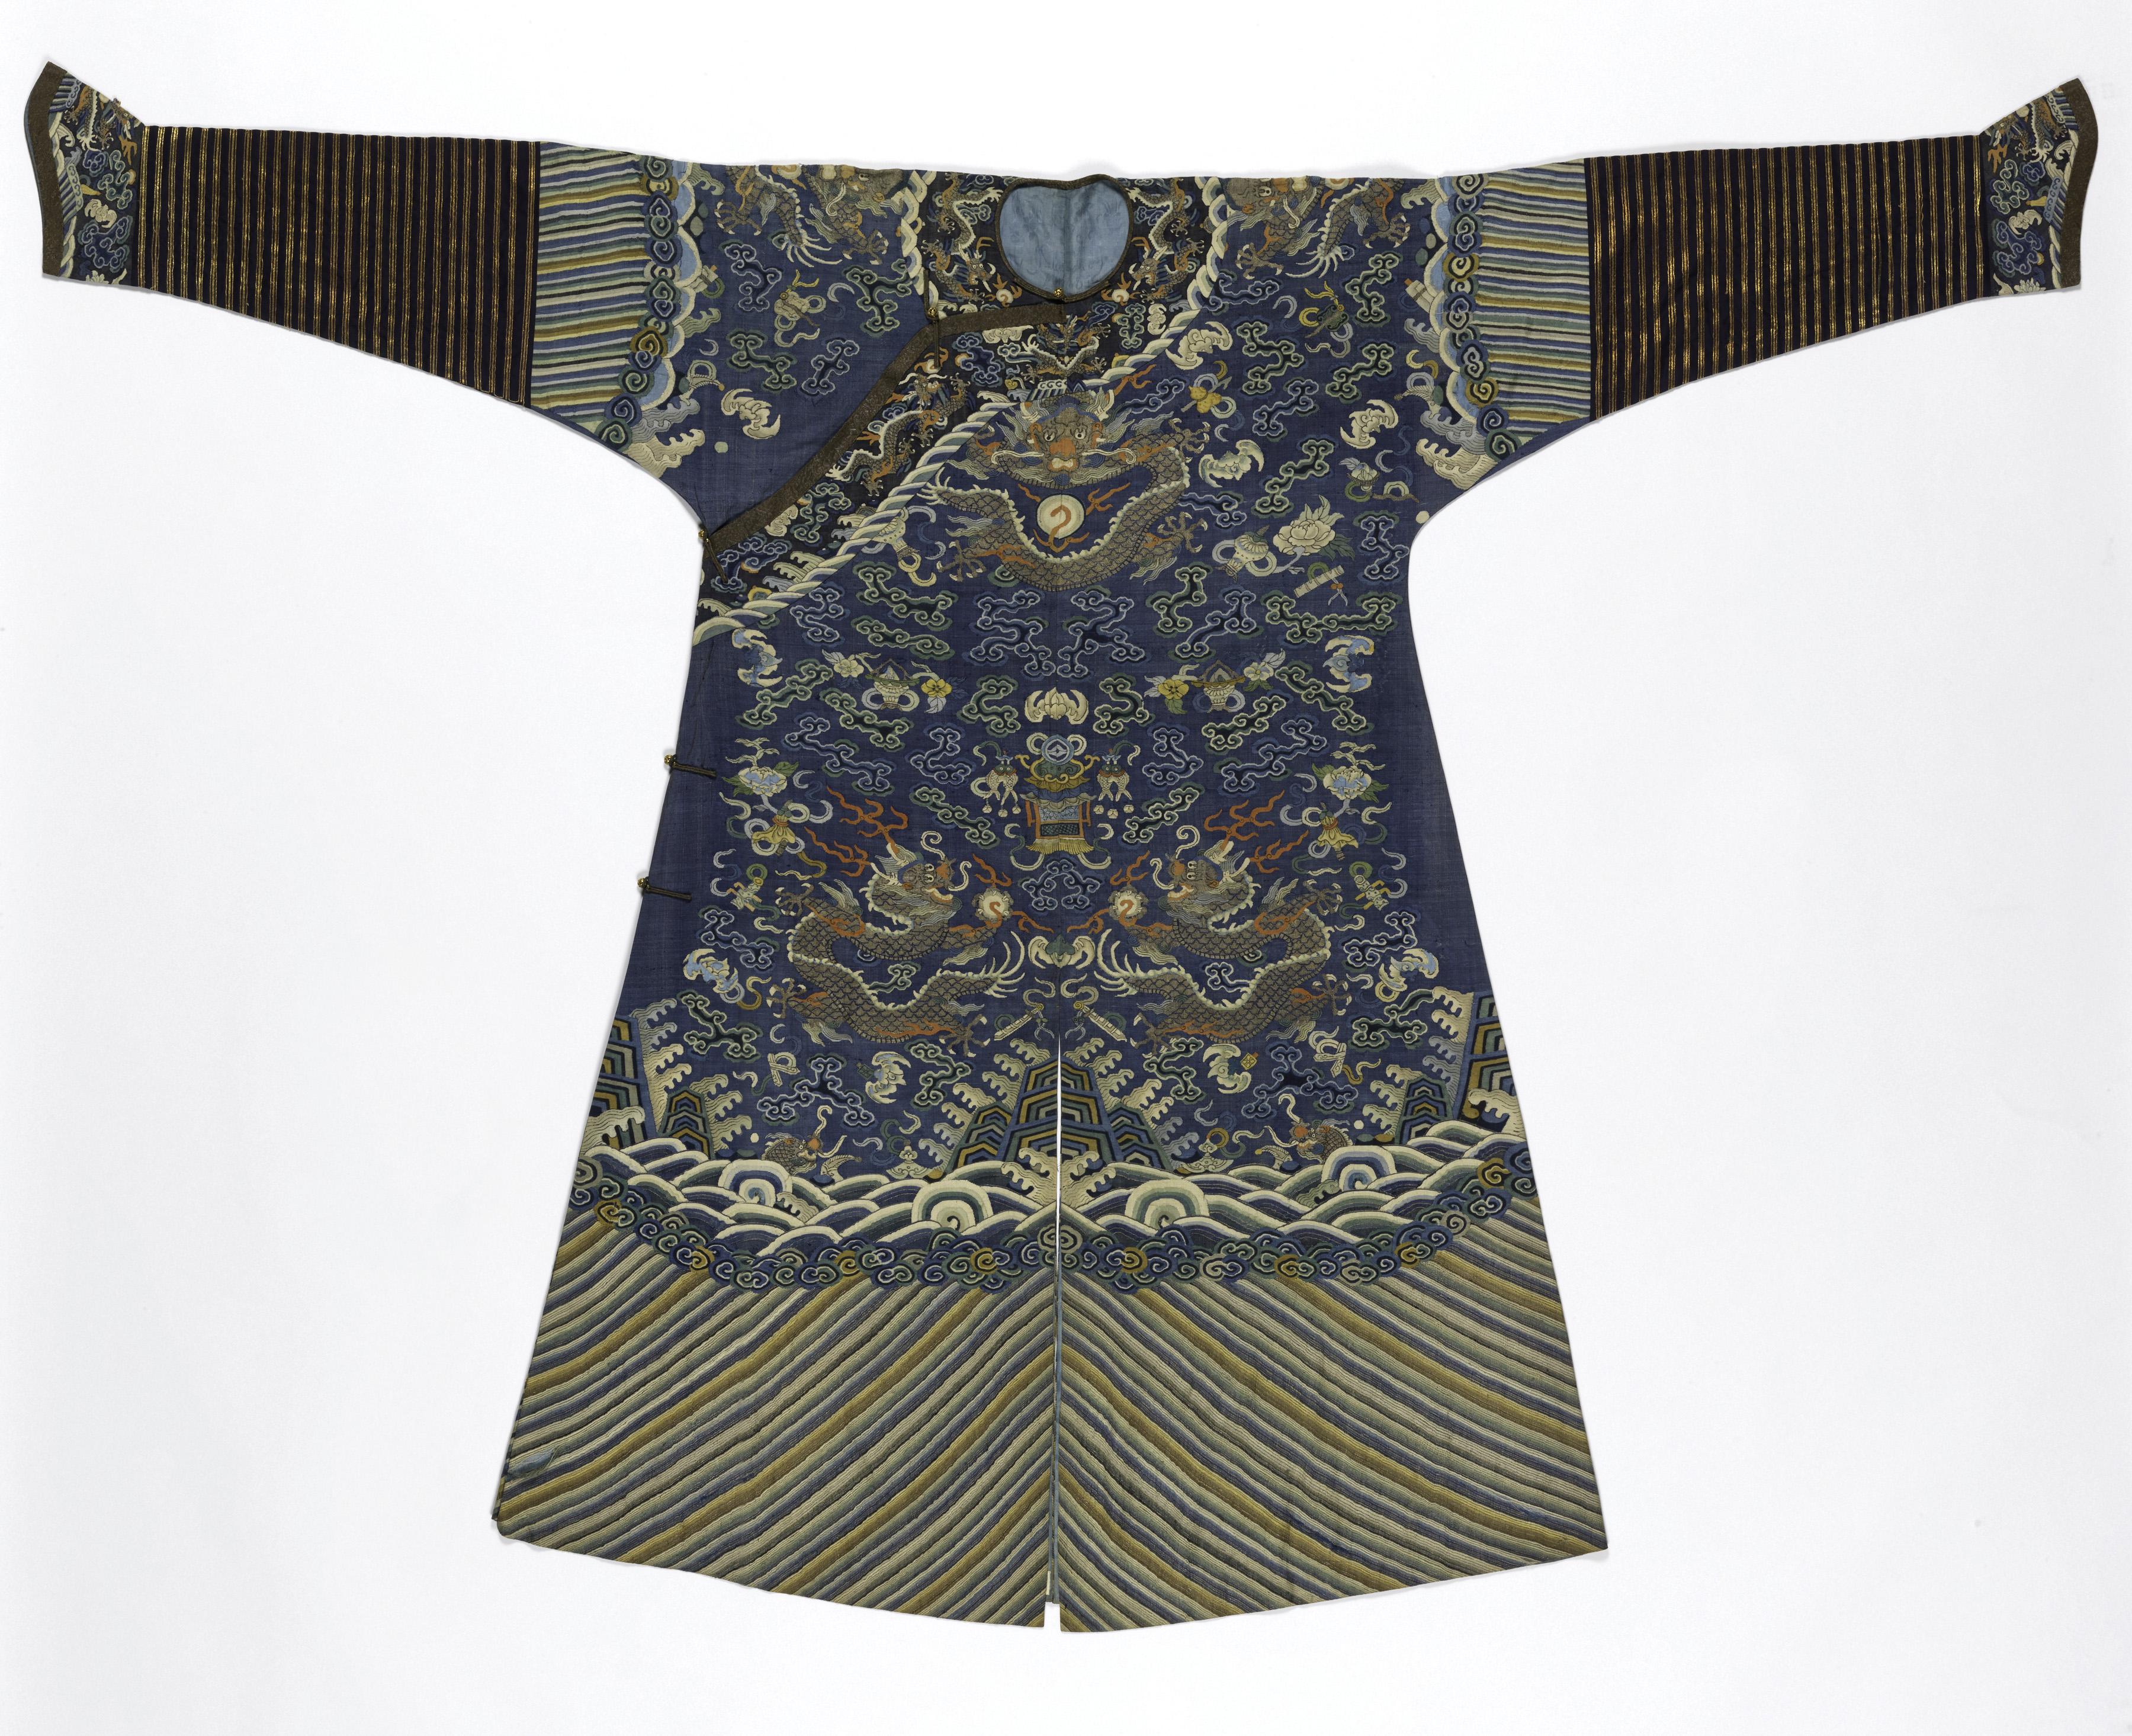 Dragon Robe, China, 19th century